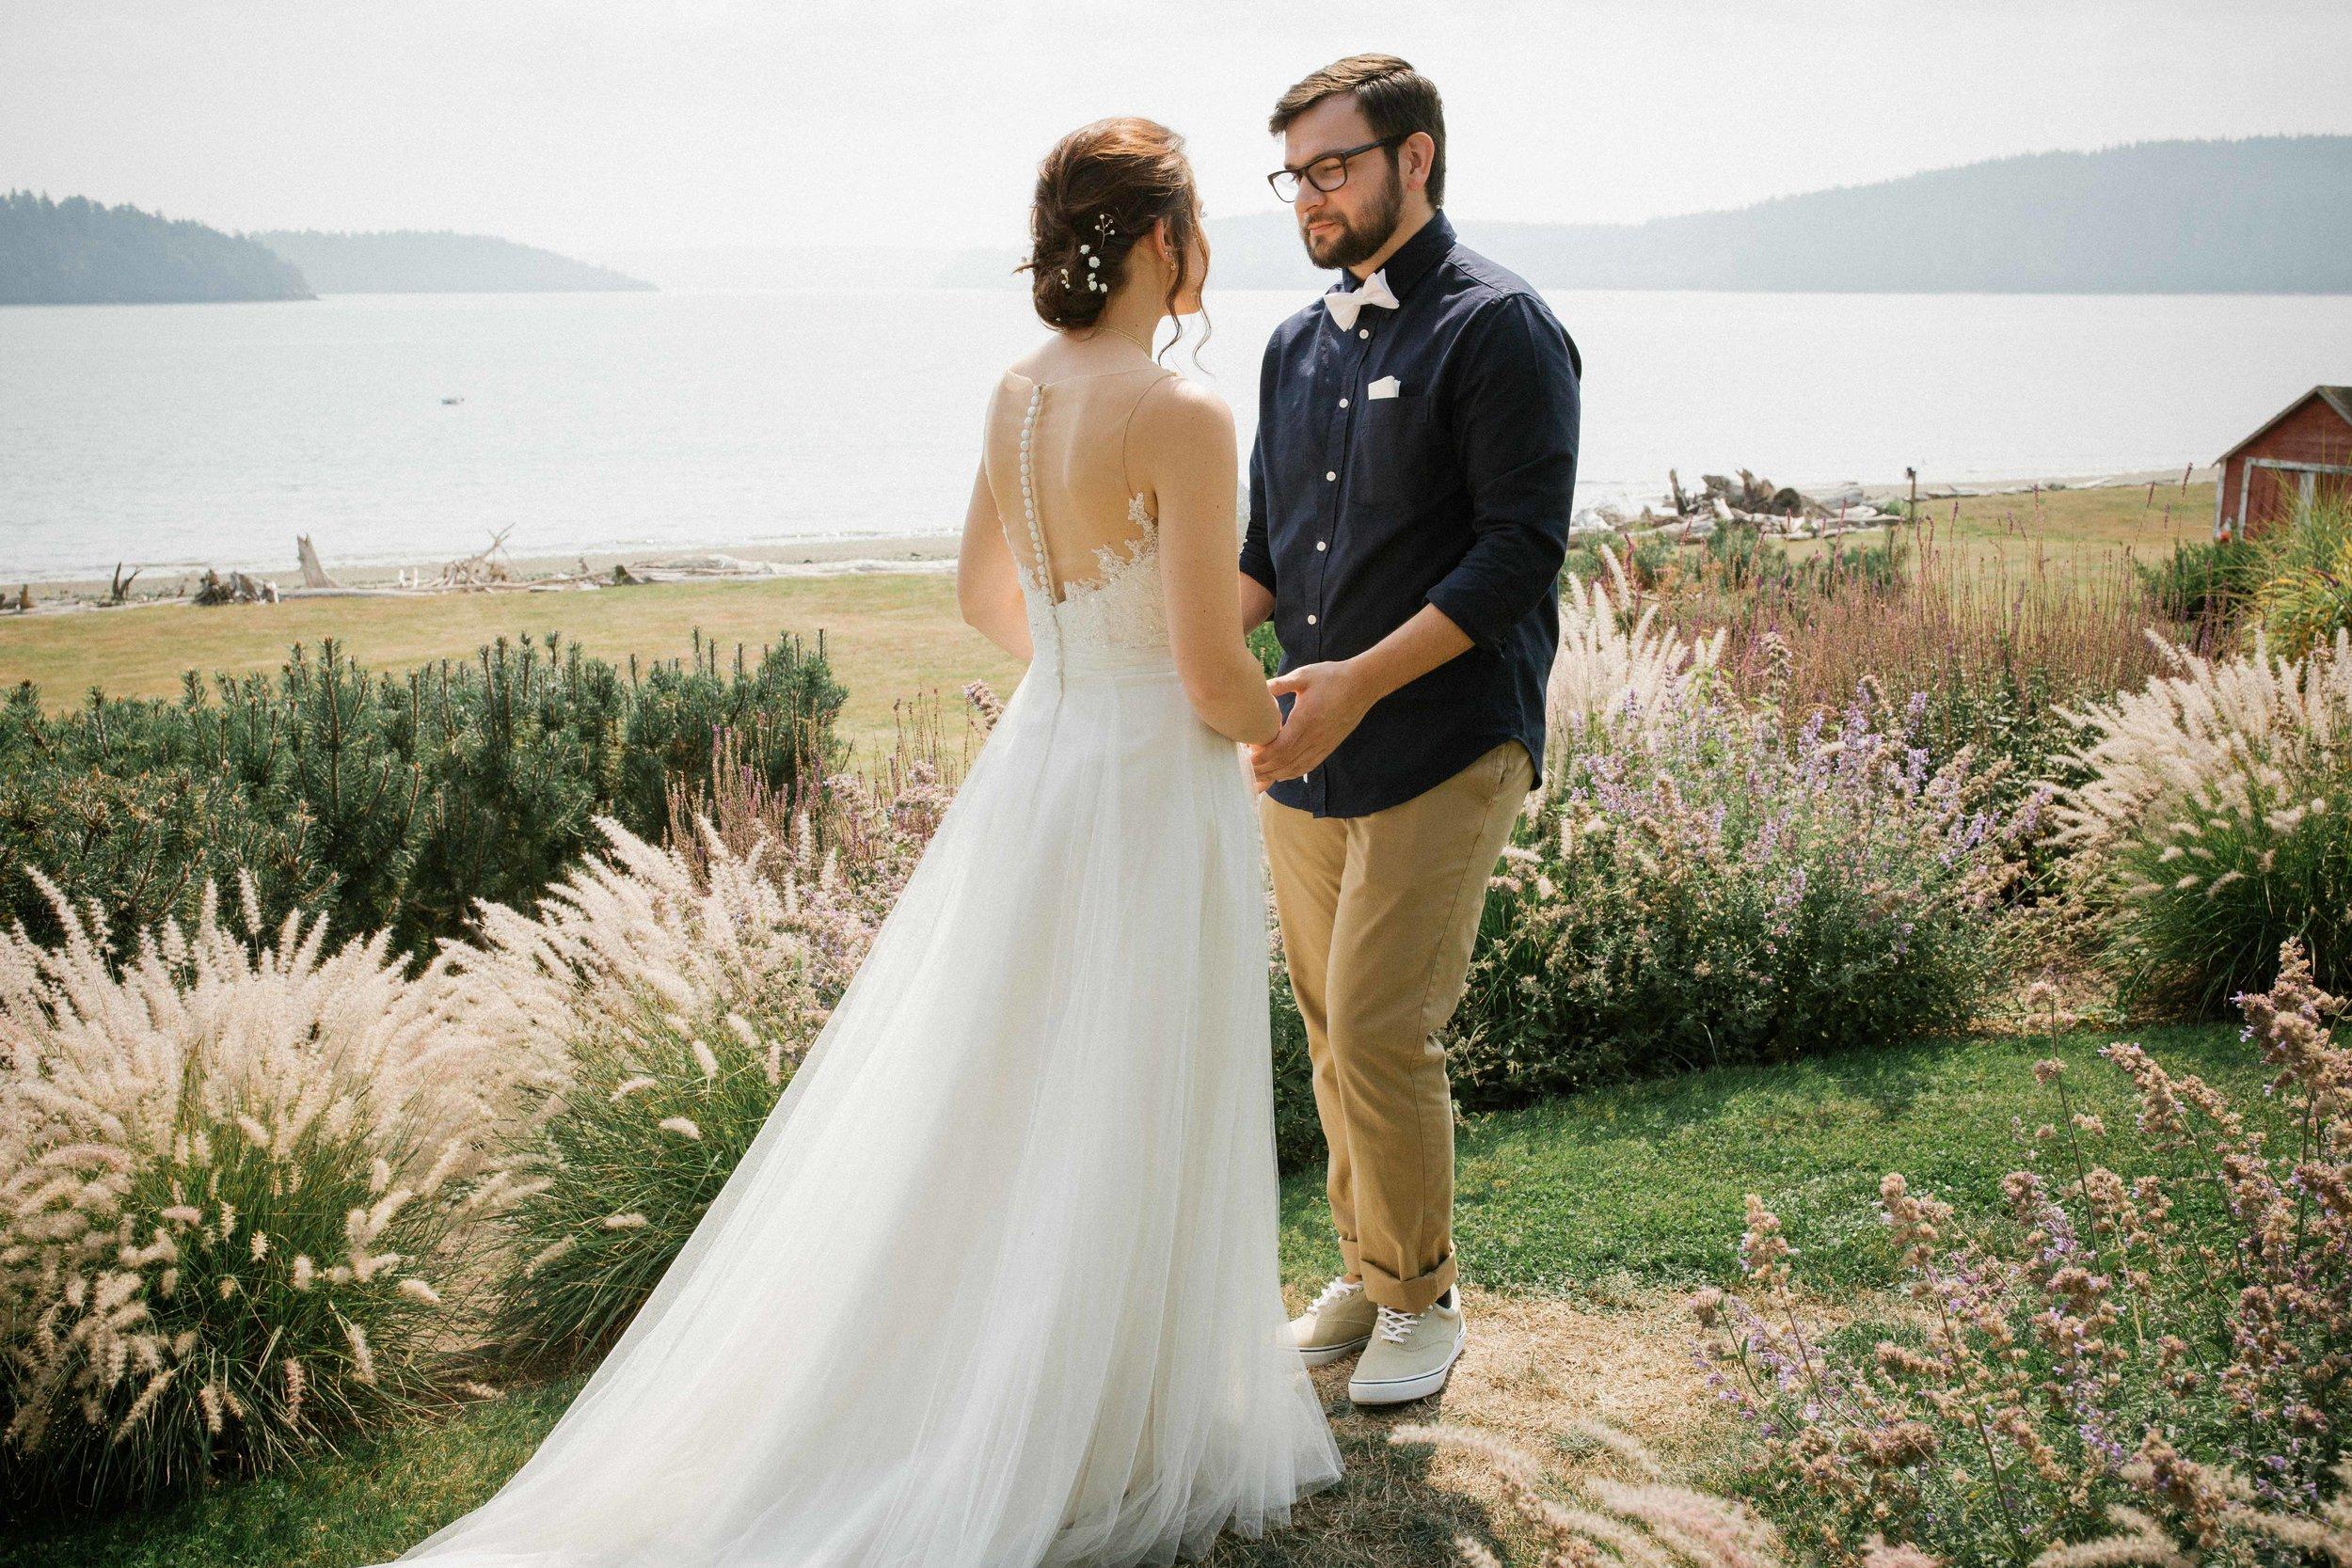 deception-pass-wedding-20.jpg